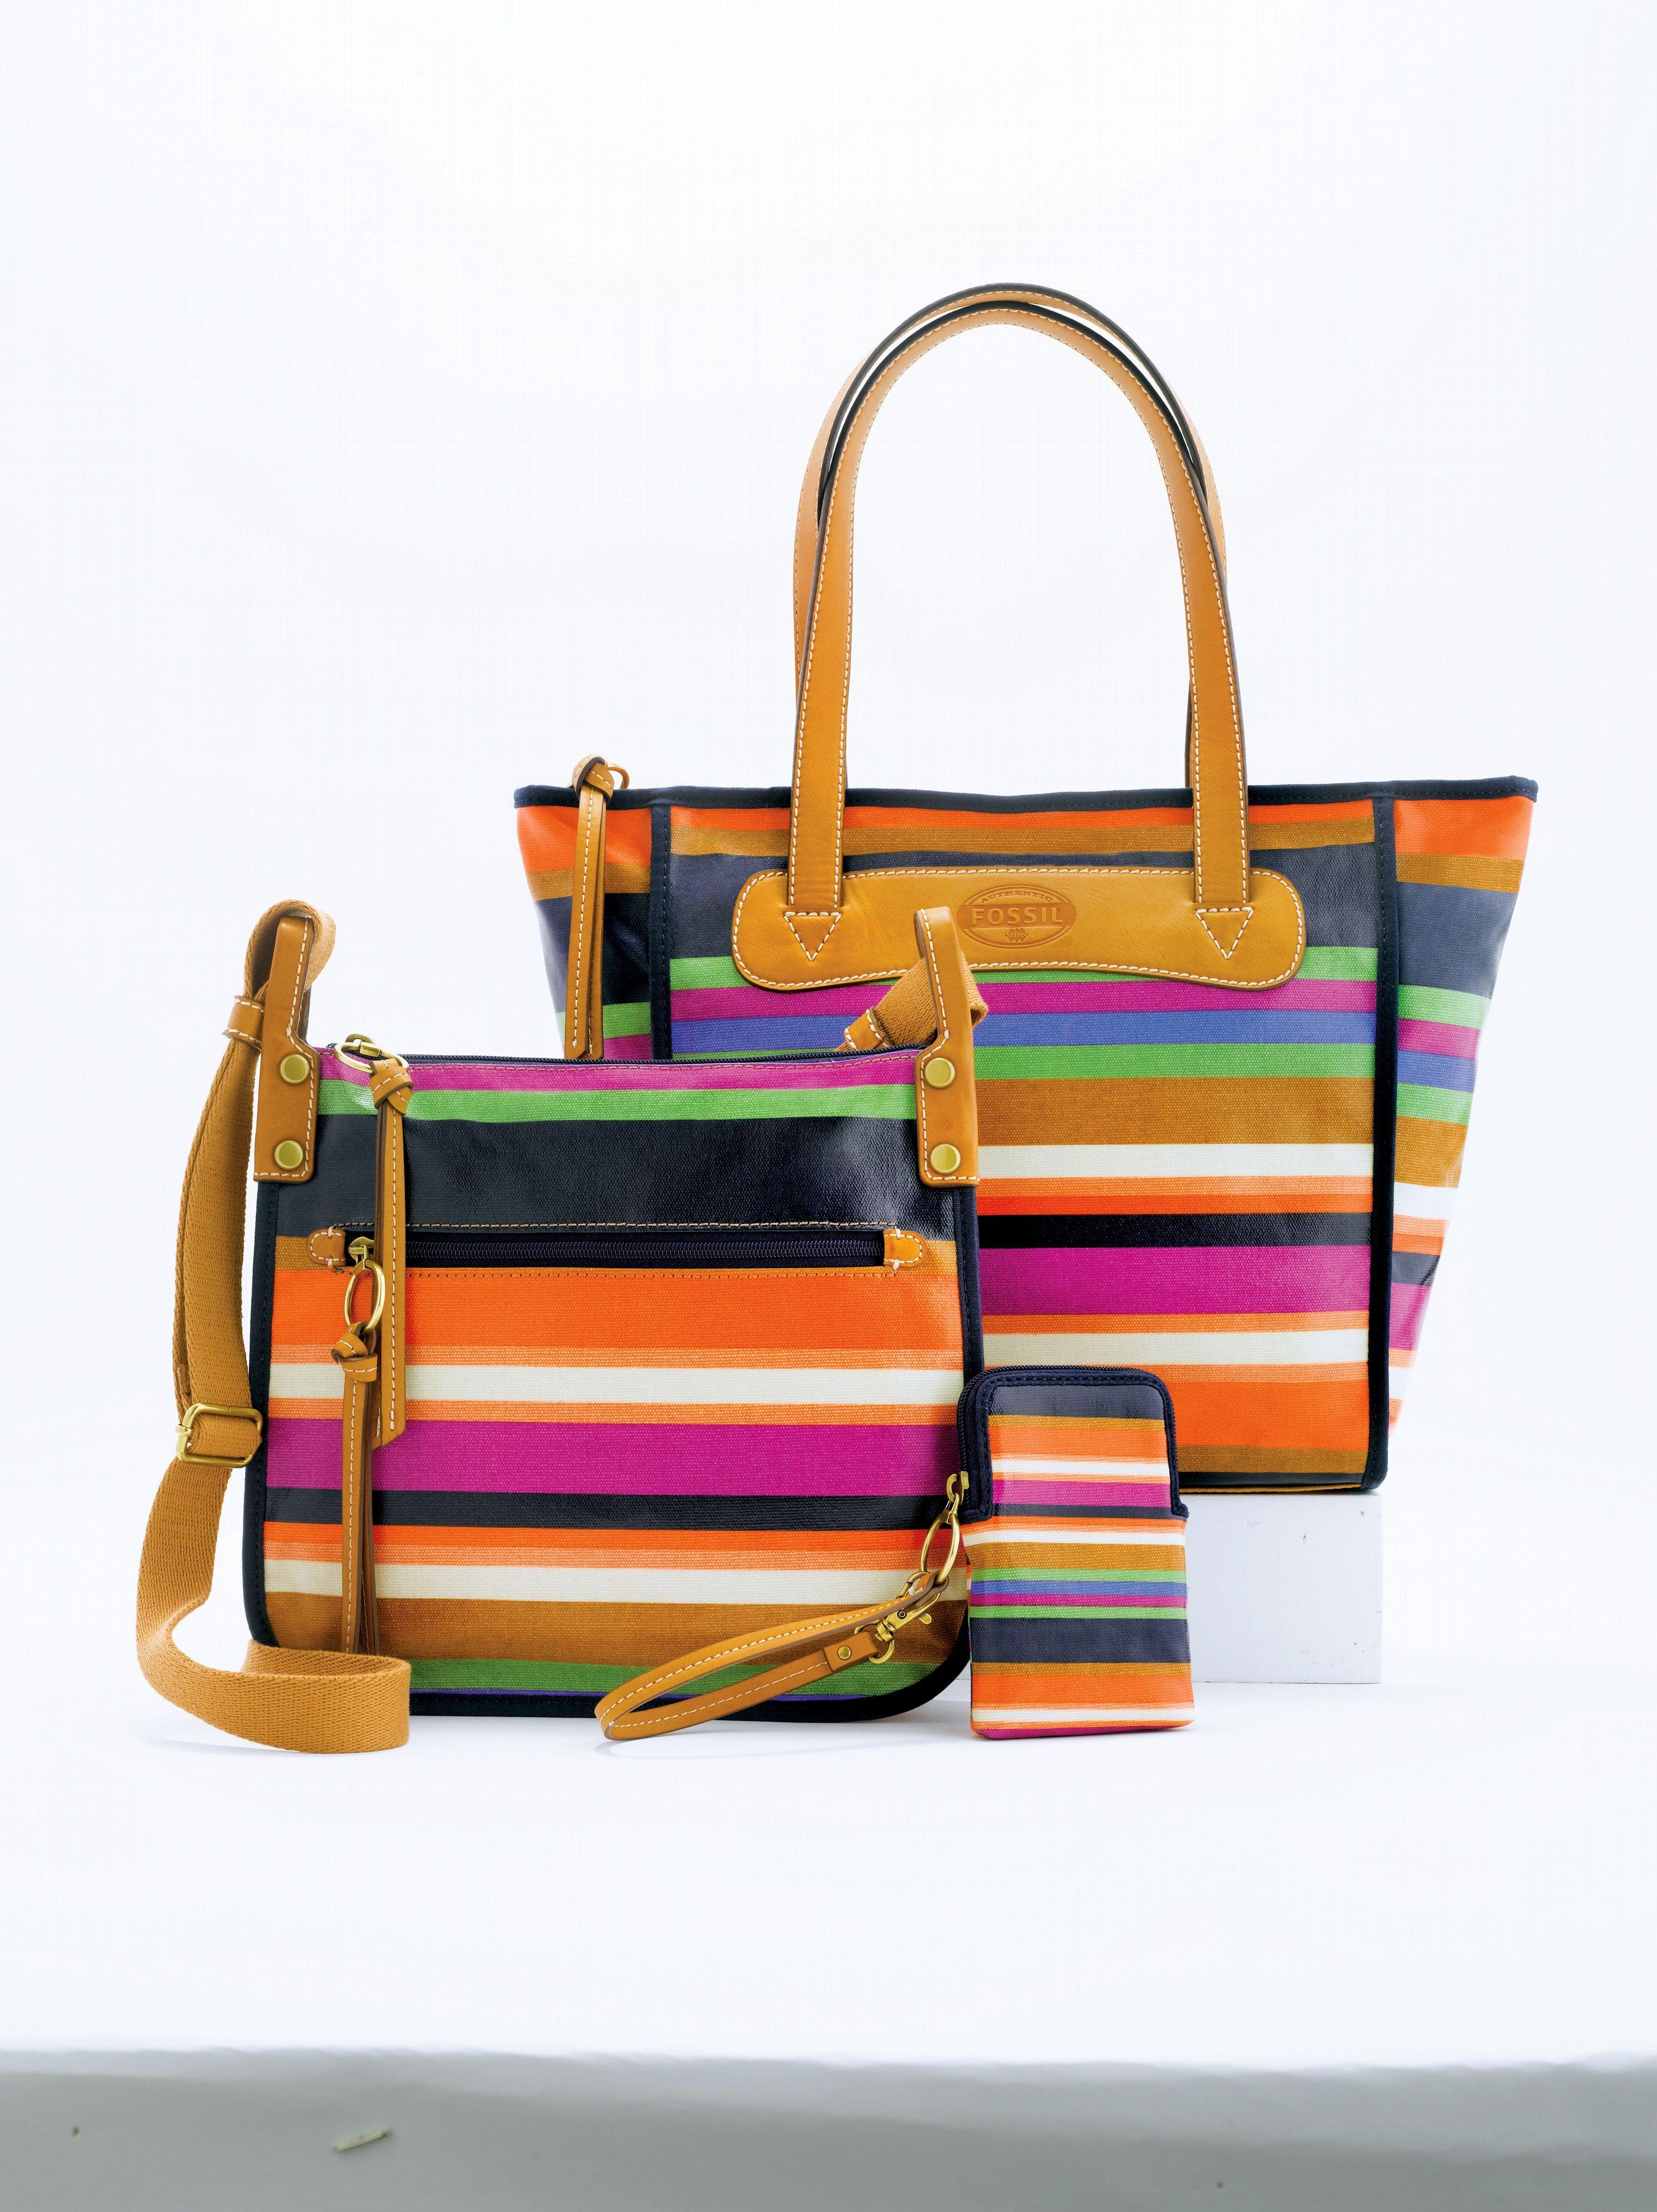 b61417b706d2 Fossil Handbags #belk #accessories | All About Accessories ...